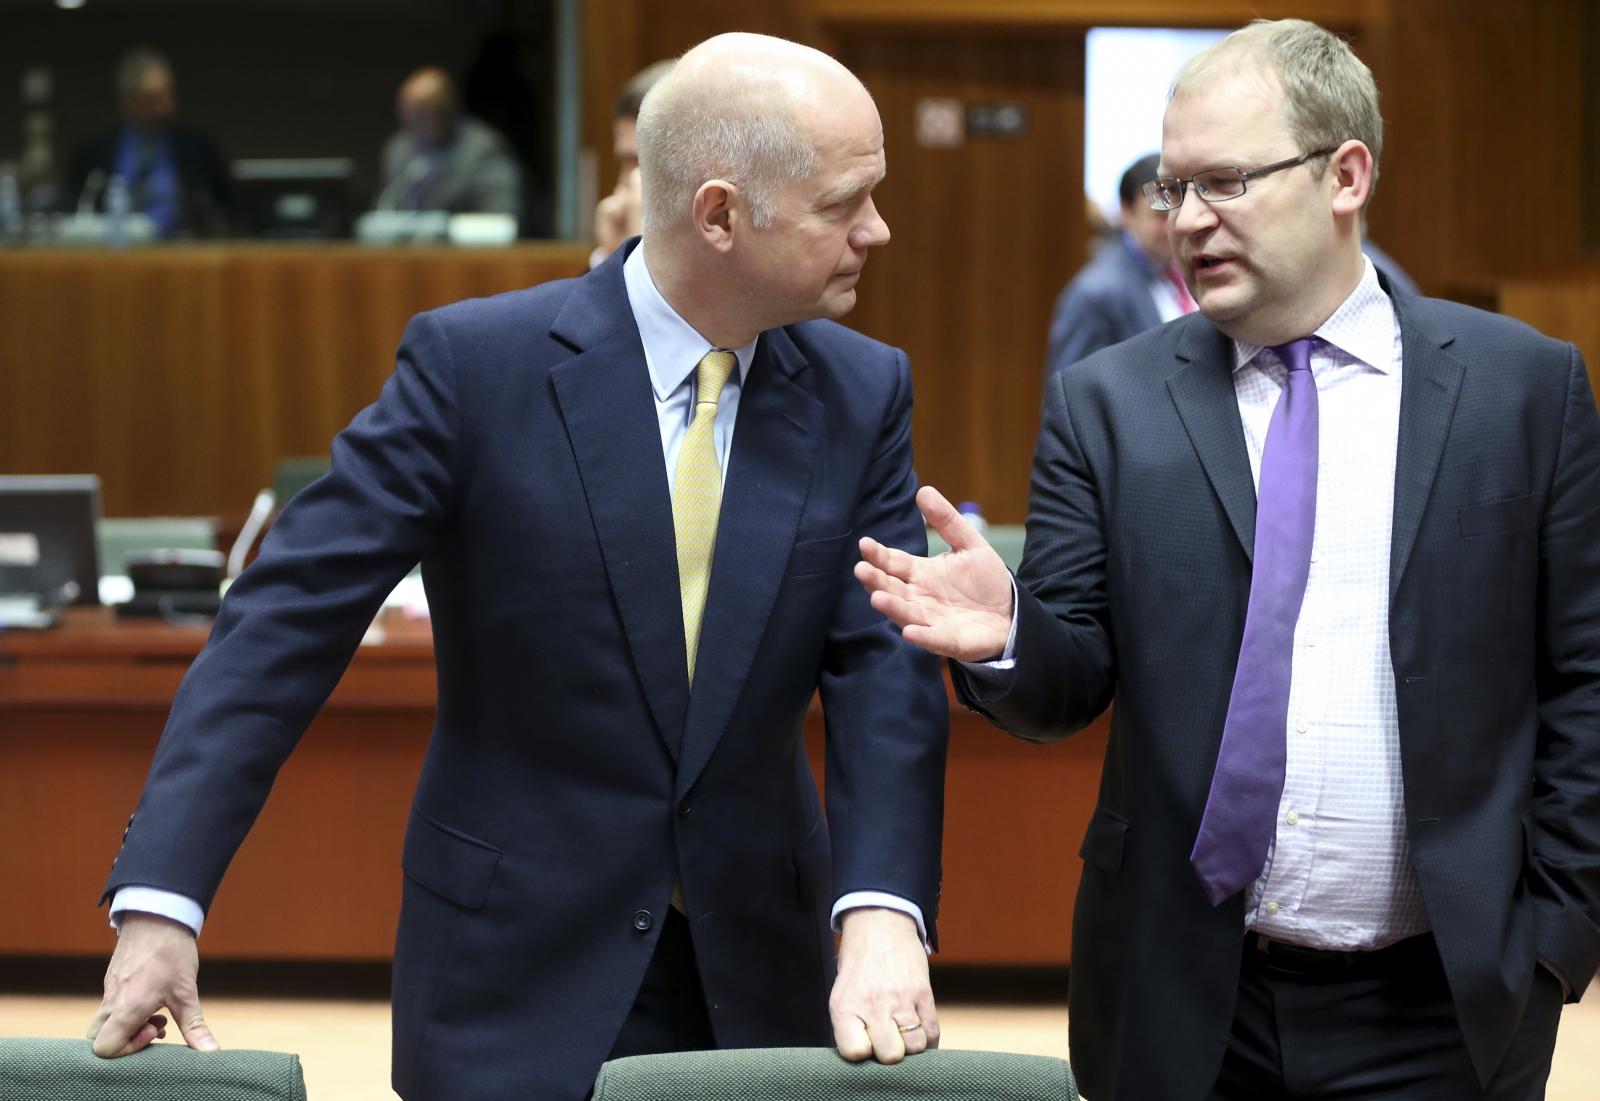 British Foreign Secretary William Hague (L) listens to Estonia's Foreign Minister Urmas Paet